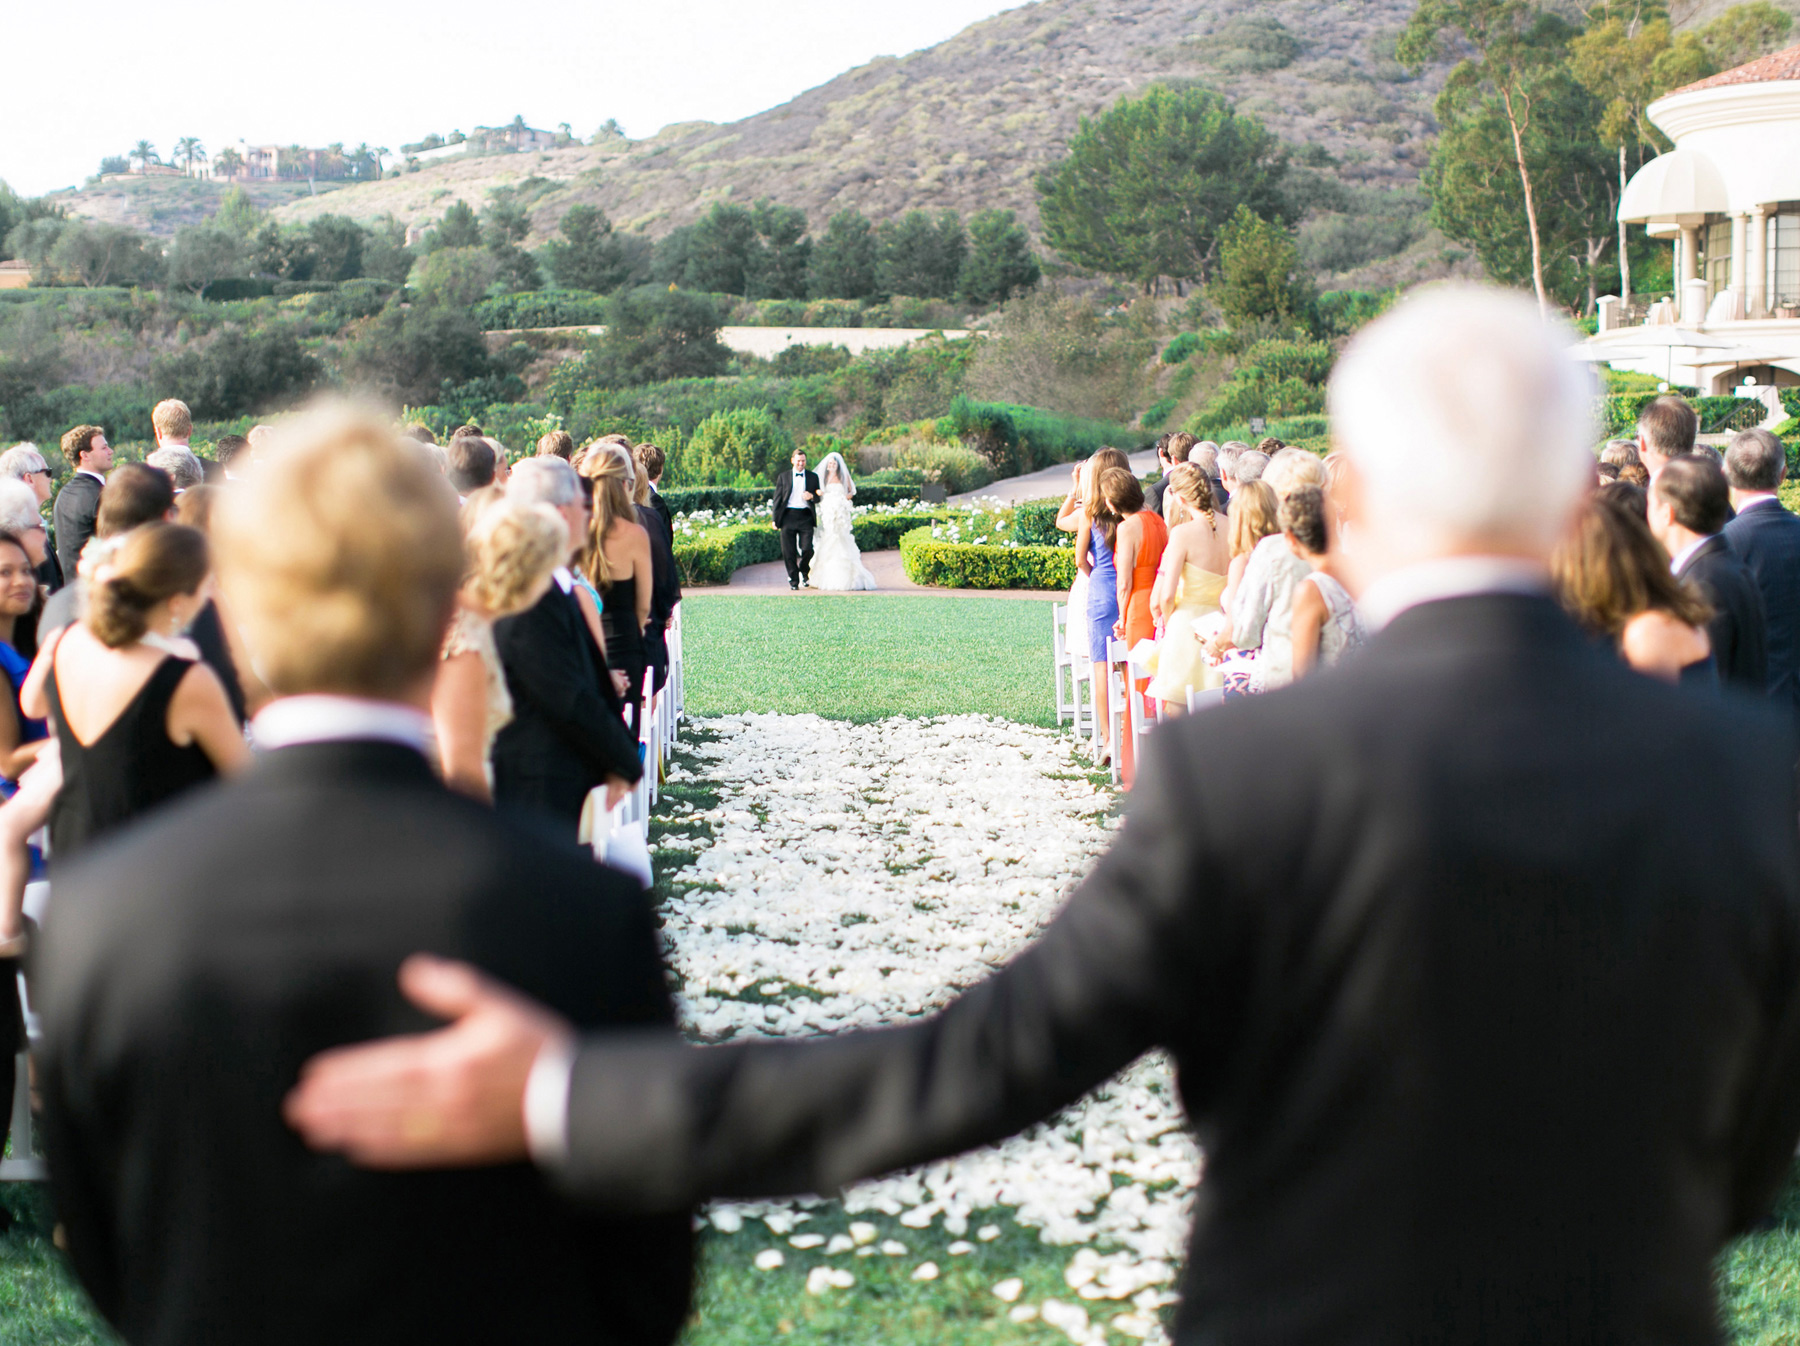 Orange-County-Fine-Art-Wedding-Photographer-24.JPG